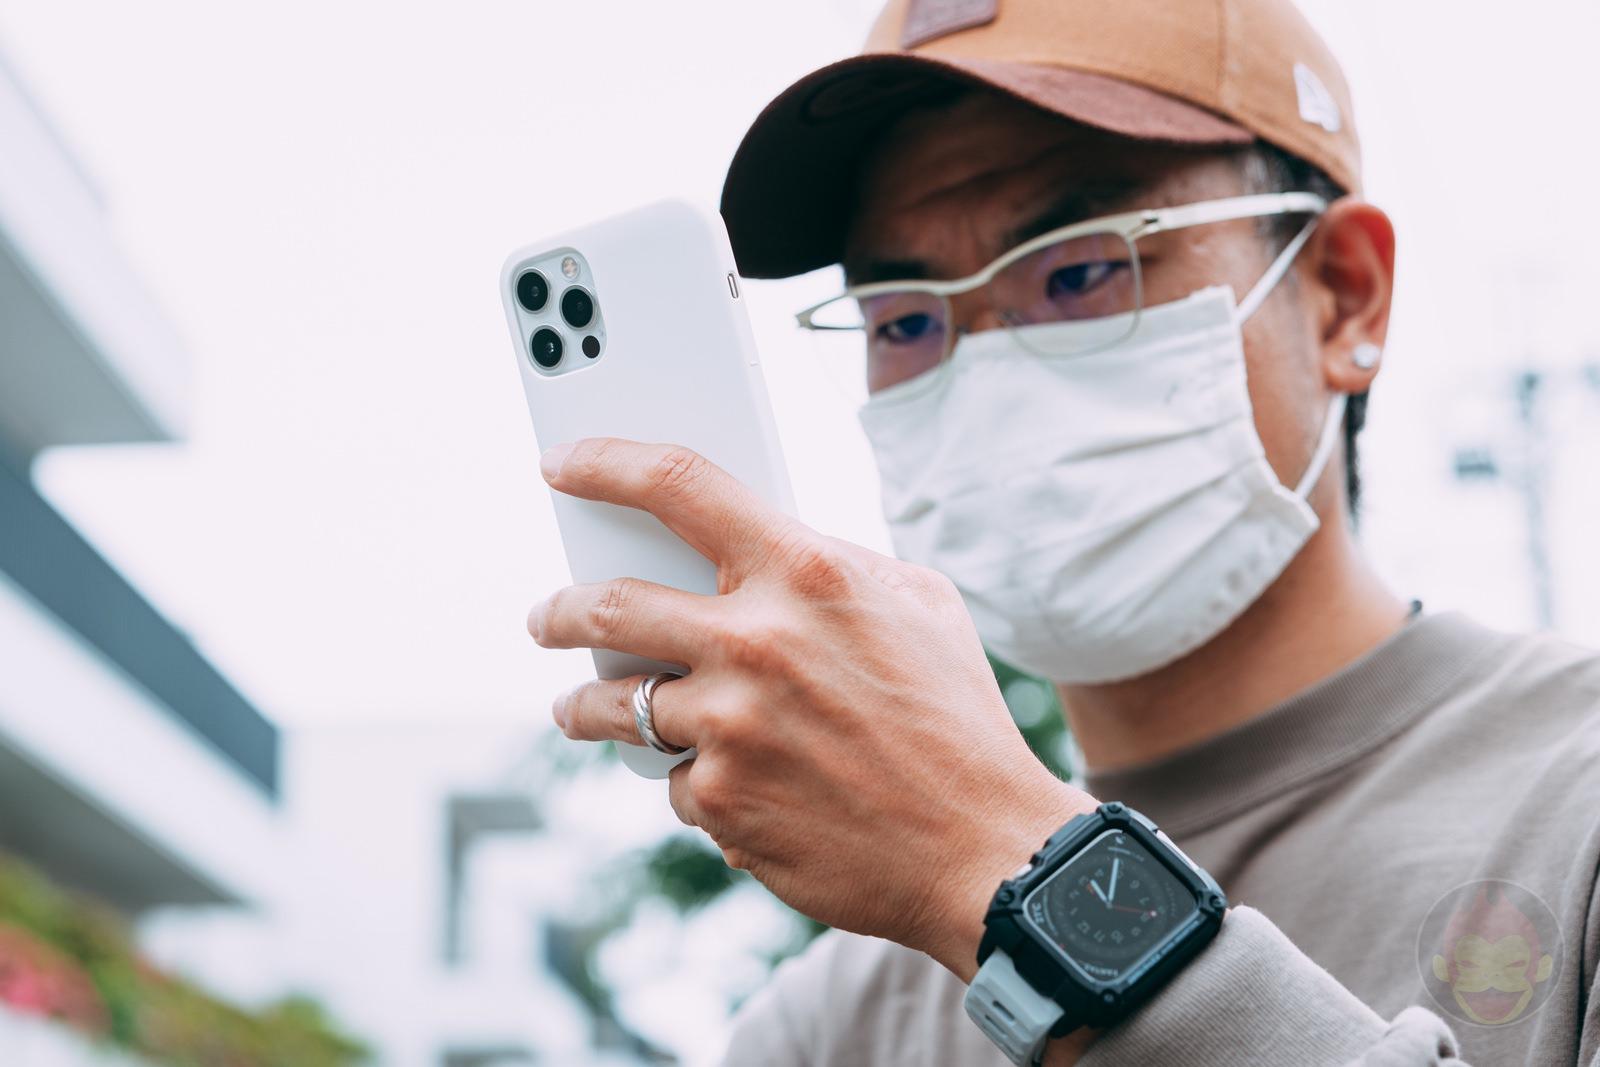 MYNUS-iPhone-12-Pro-Case-Review-06.jpg